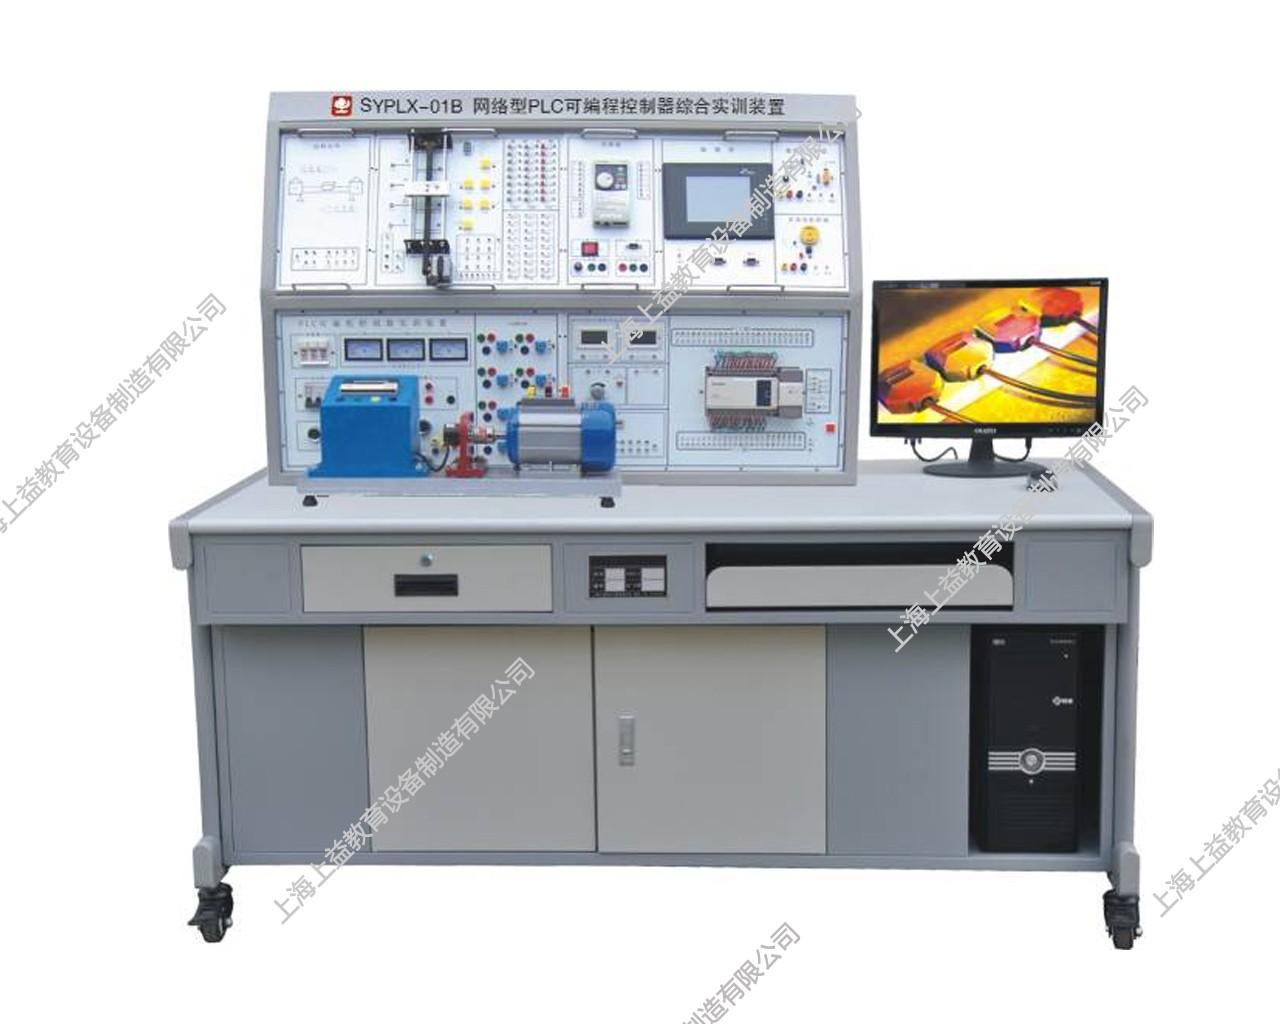 SYPLX-01B网络型PLC可编程控制器综合wwwlehu8vip装置(PLC+变频调速+电气控制+触摸屏)